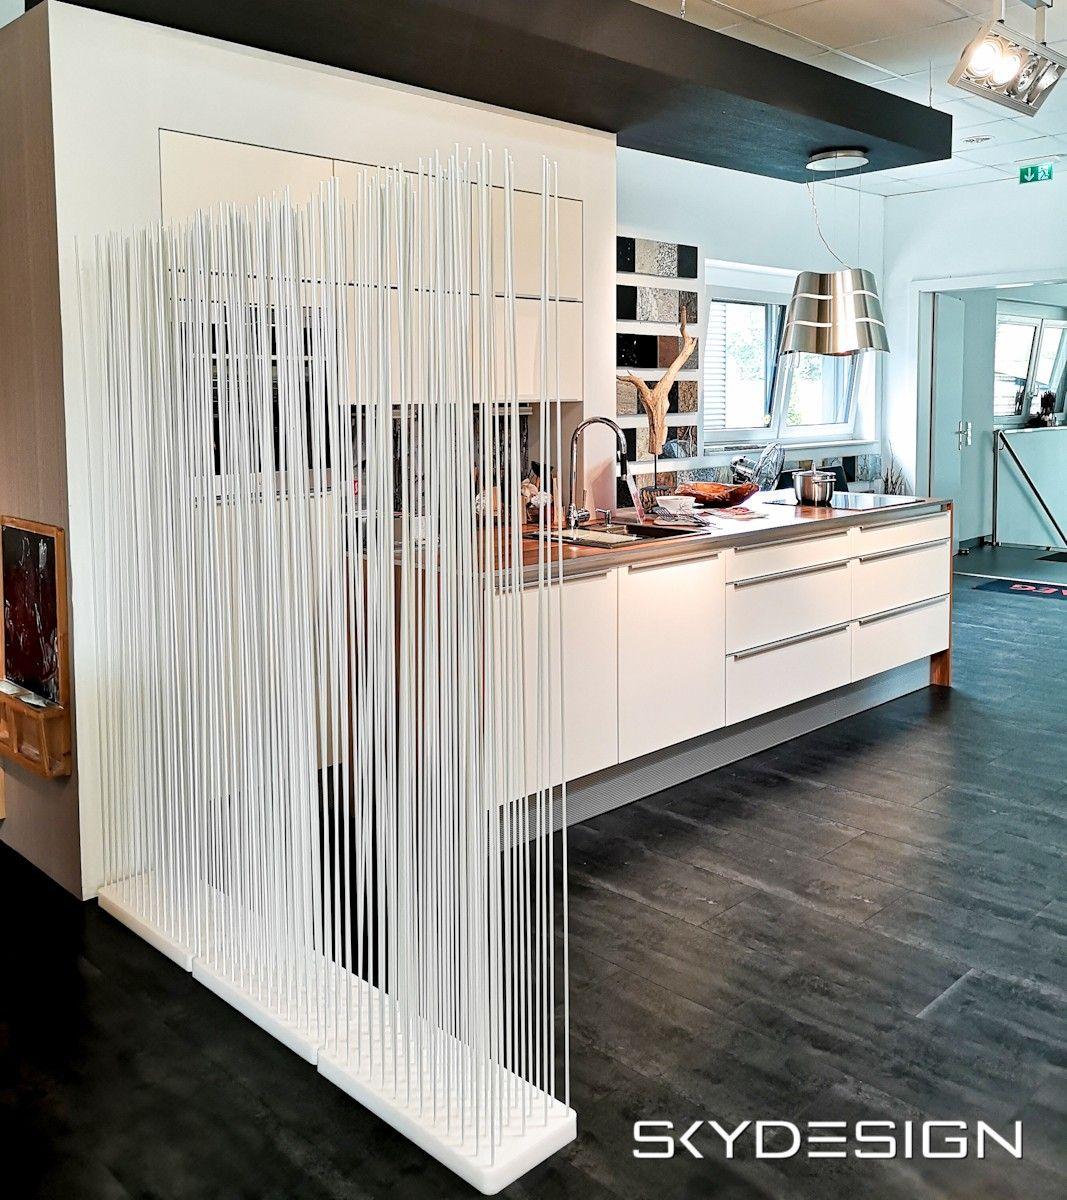 Sichtschutz Kuche Raumteiler Raumteiler Ideen Haus